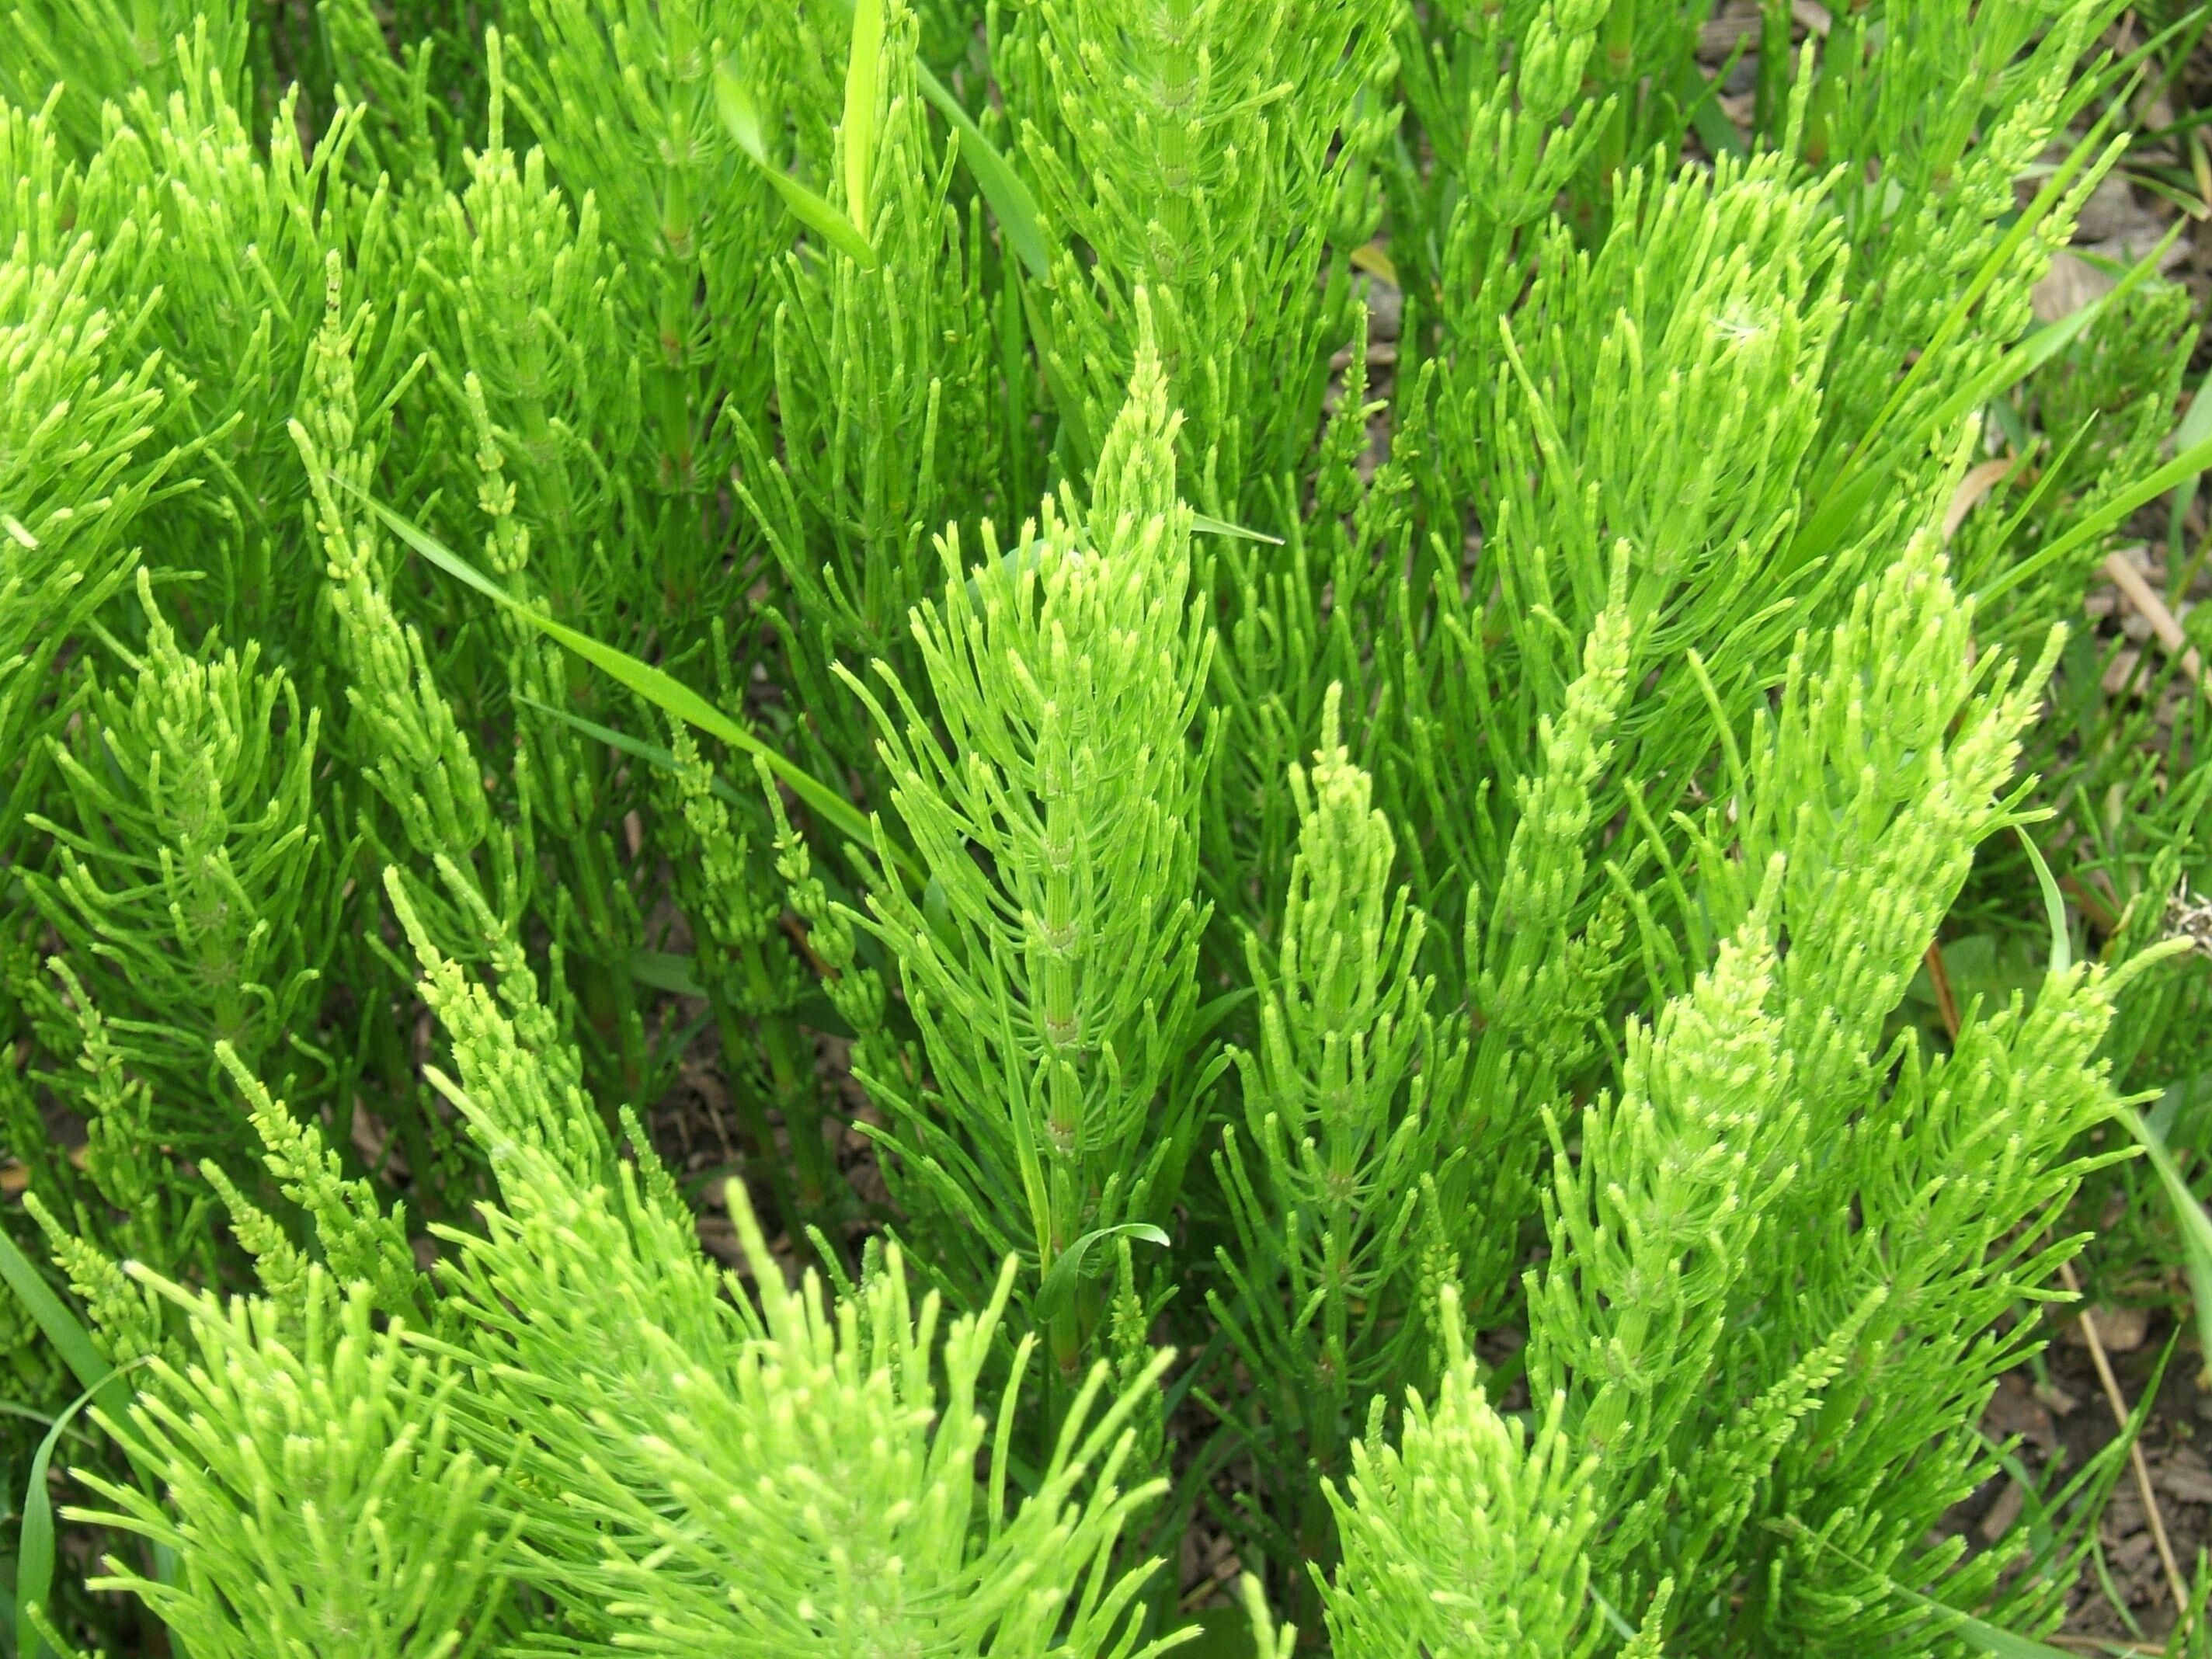 درمان ریزش مو با عصاره گیاهی